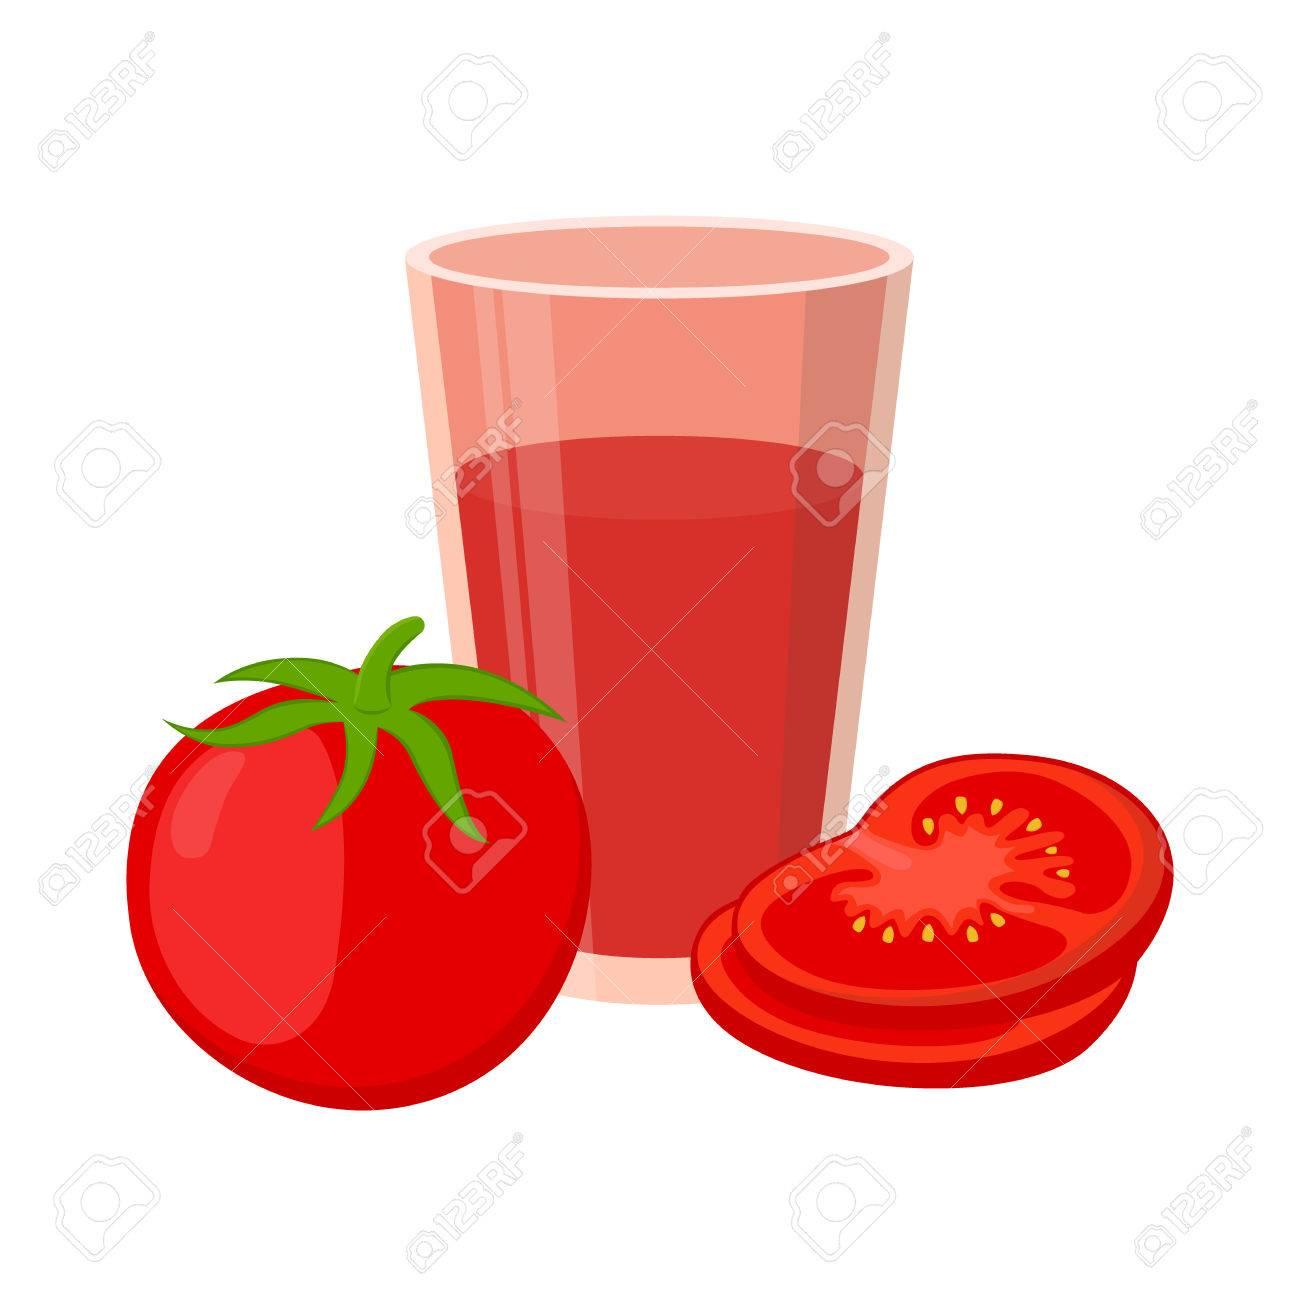 Tomato juice red tomatoes. cartoon flat style. vegetarian fresh